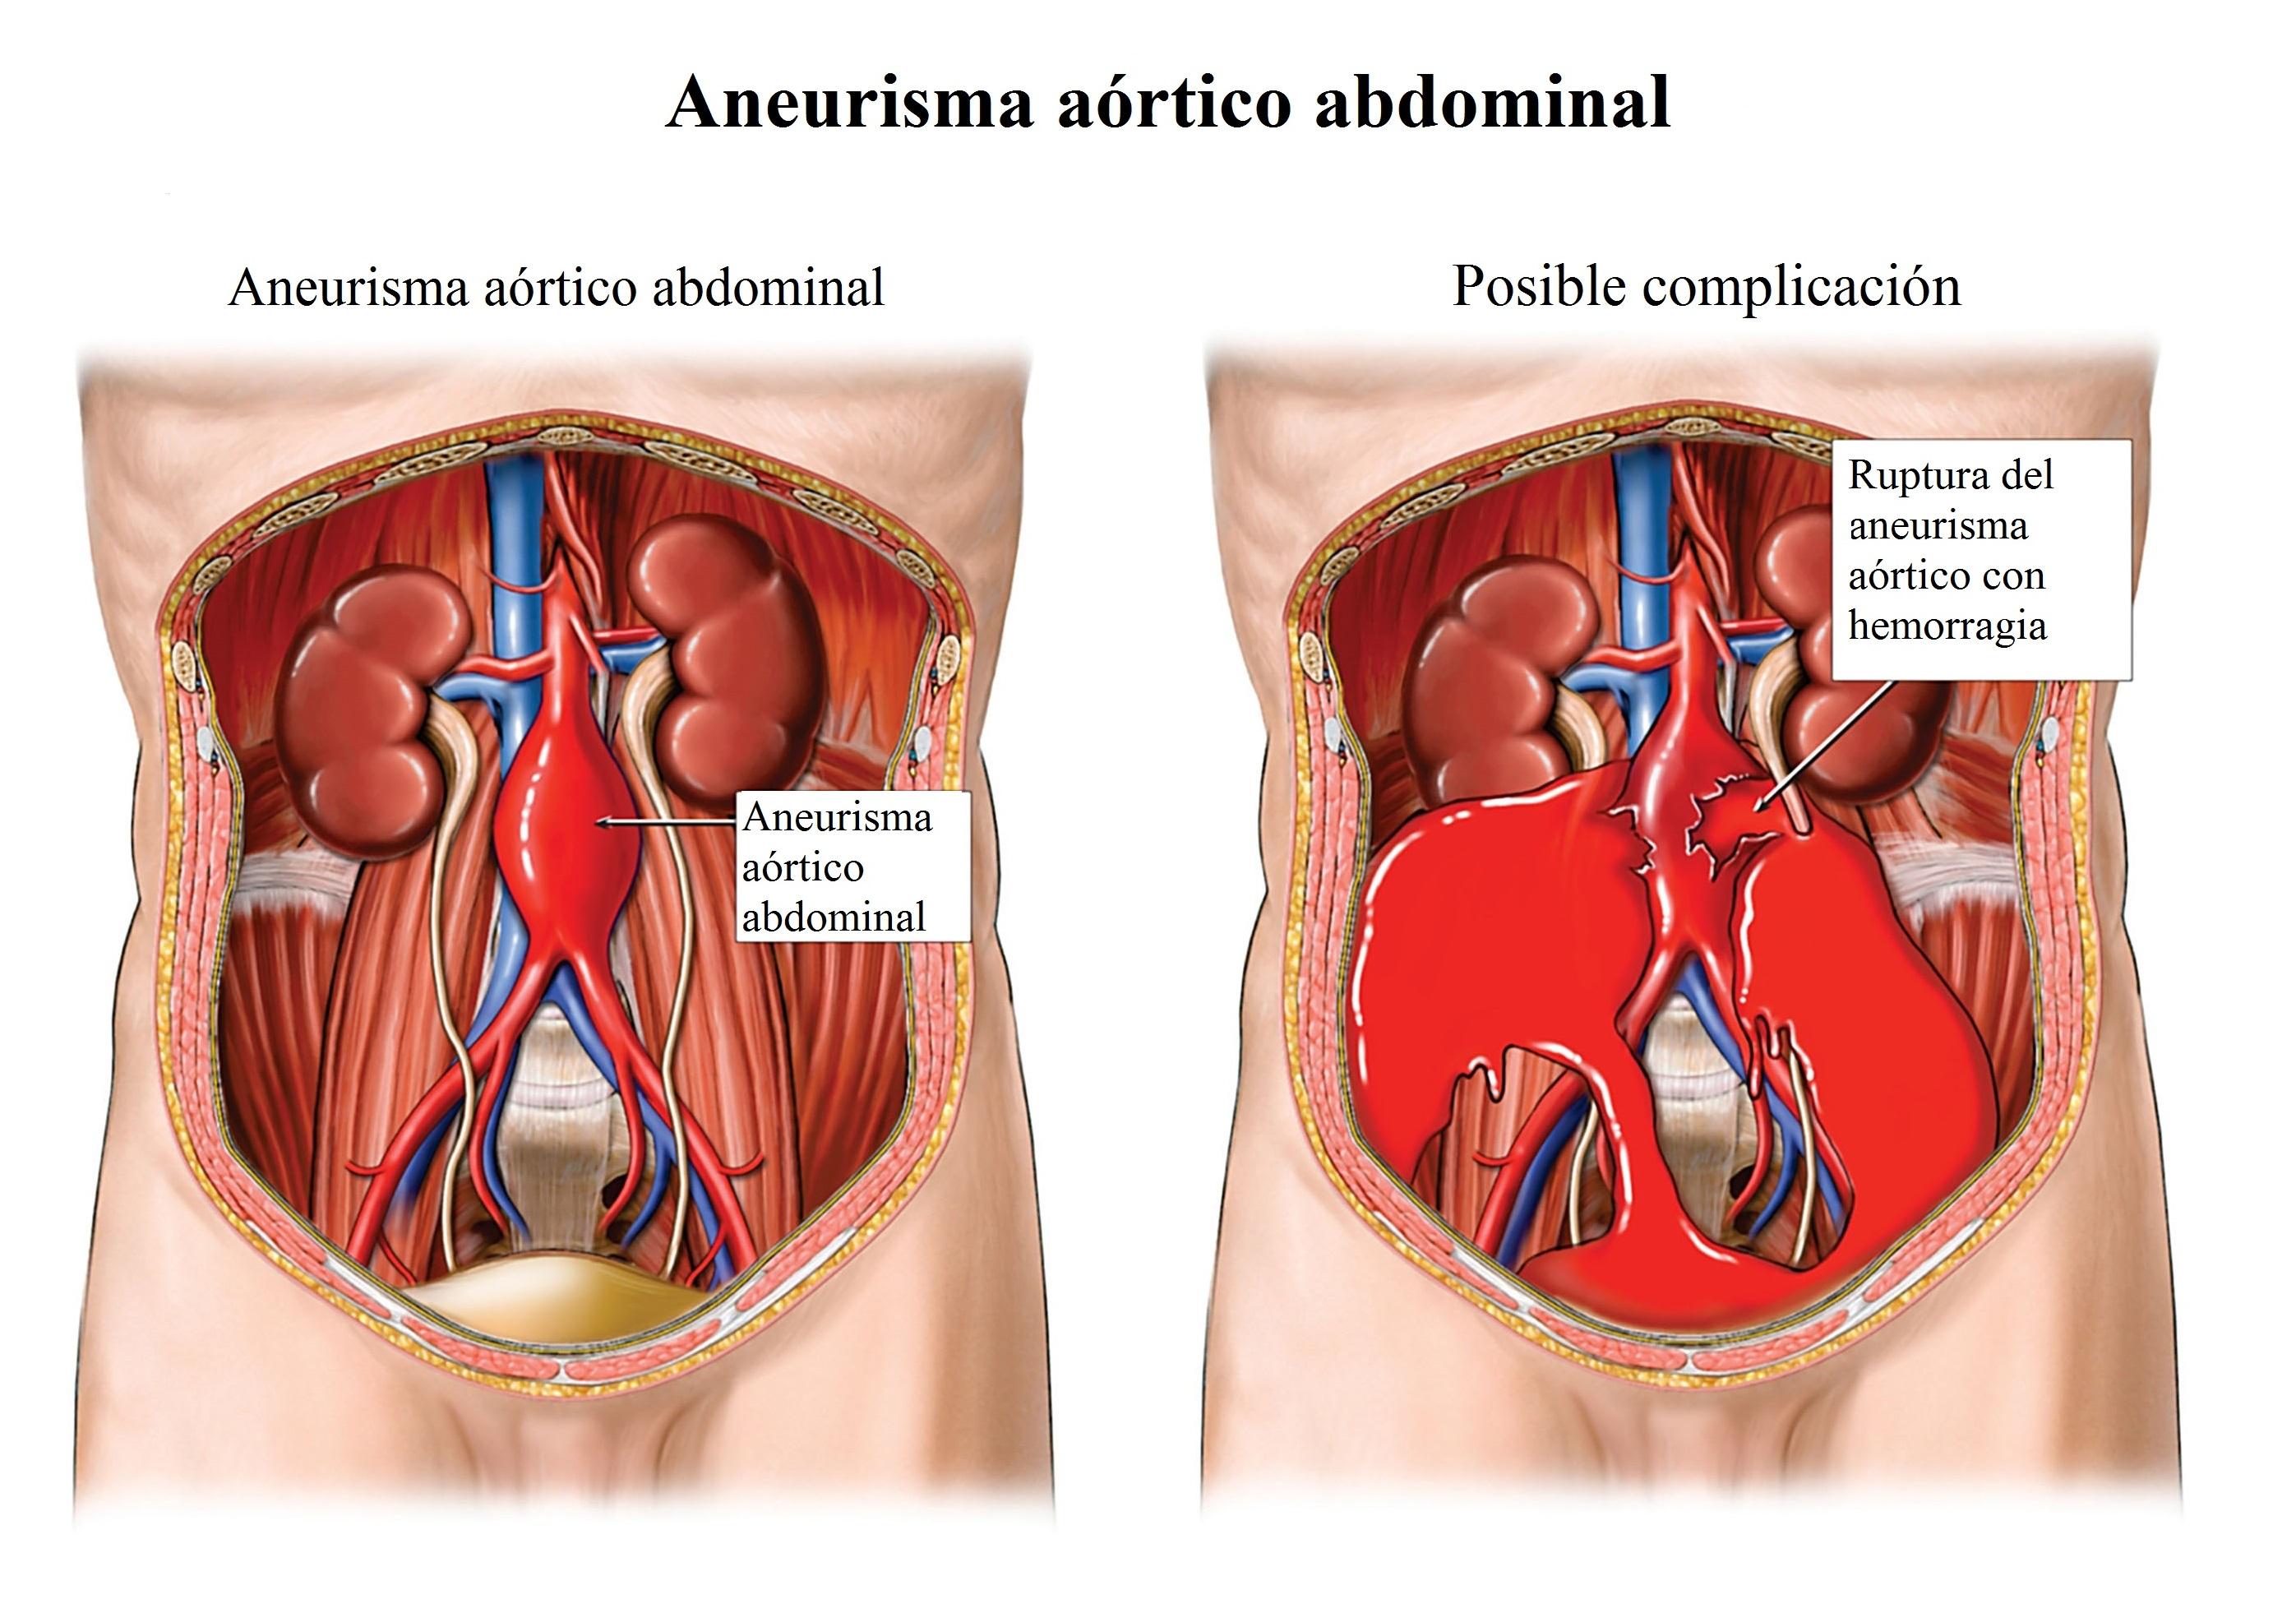 Ruptura del aneurisma, aorta, abdominal